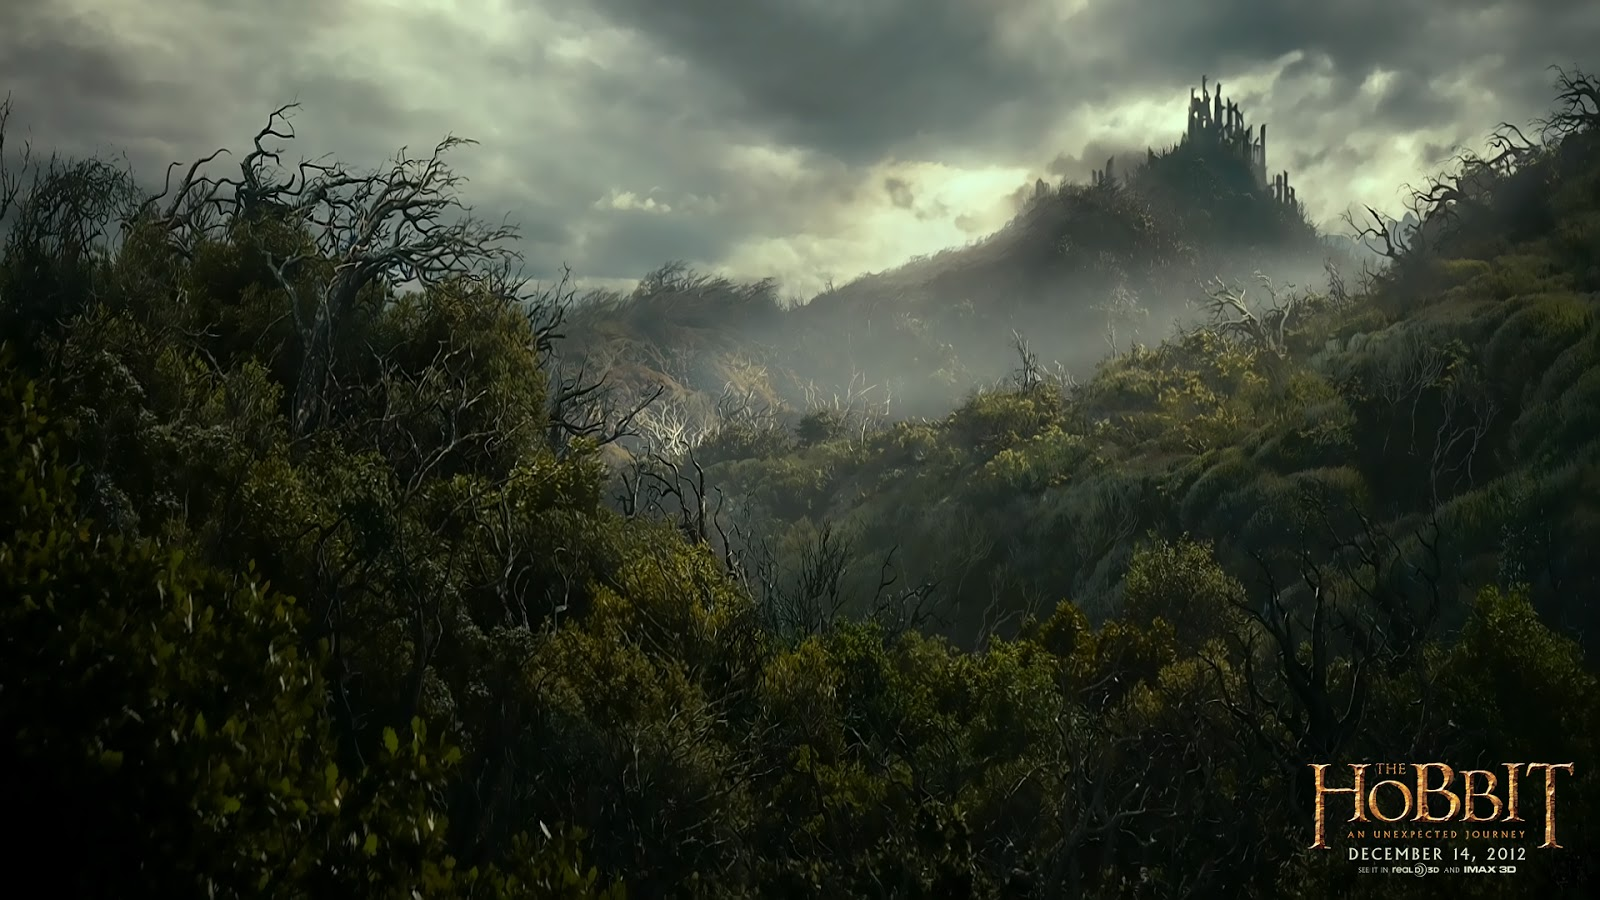 Hobbit gmail theme - Hobbit Gmail Theme 24